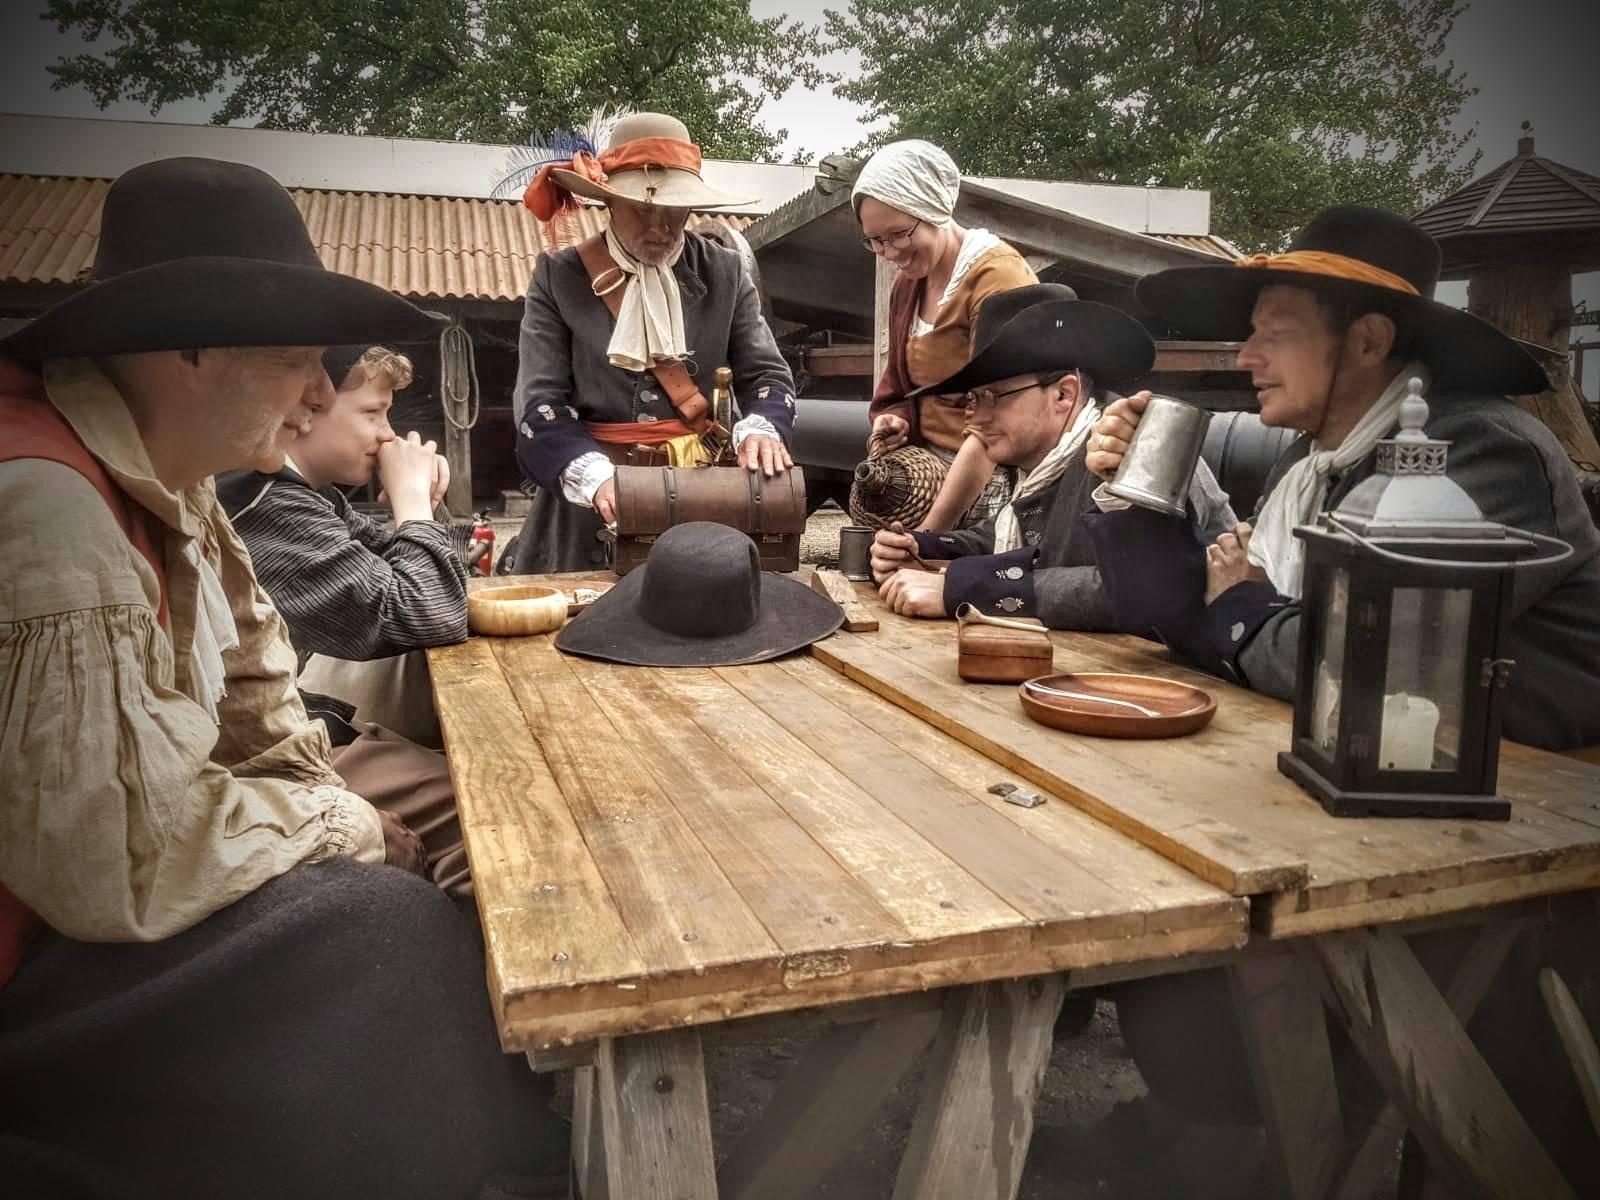 Mariniers 1667 - Michiel de Ruyter - Equipage De Delft - Bataviawerf - Batavialand Lelystad - Dutch Marines - Tocht naar Chatham - Zeesoldaten 4